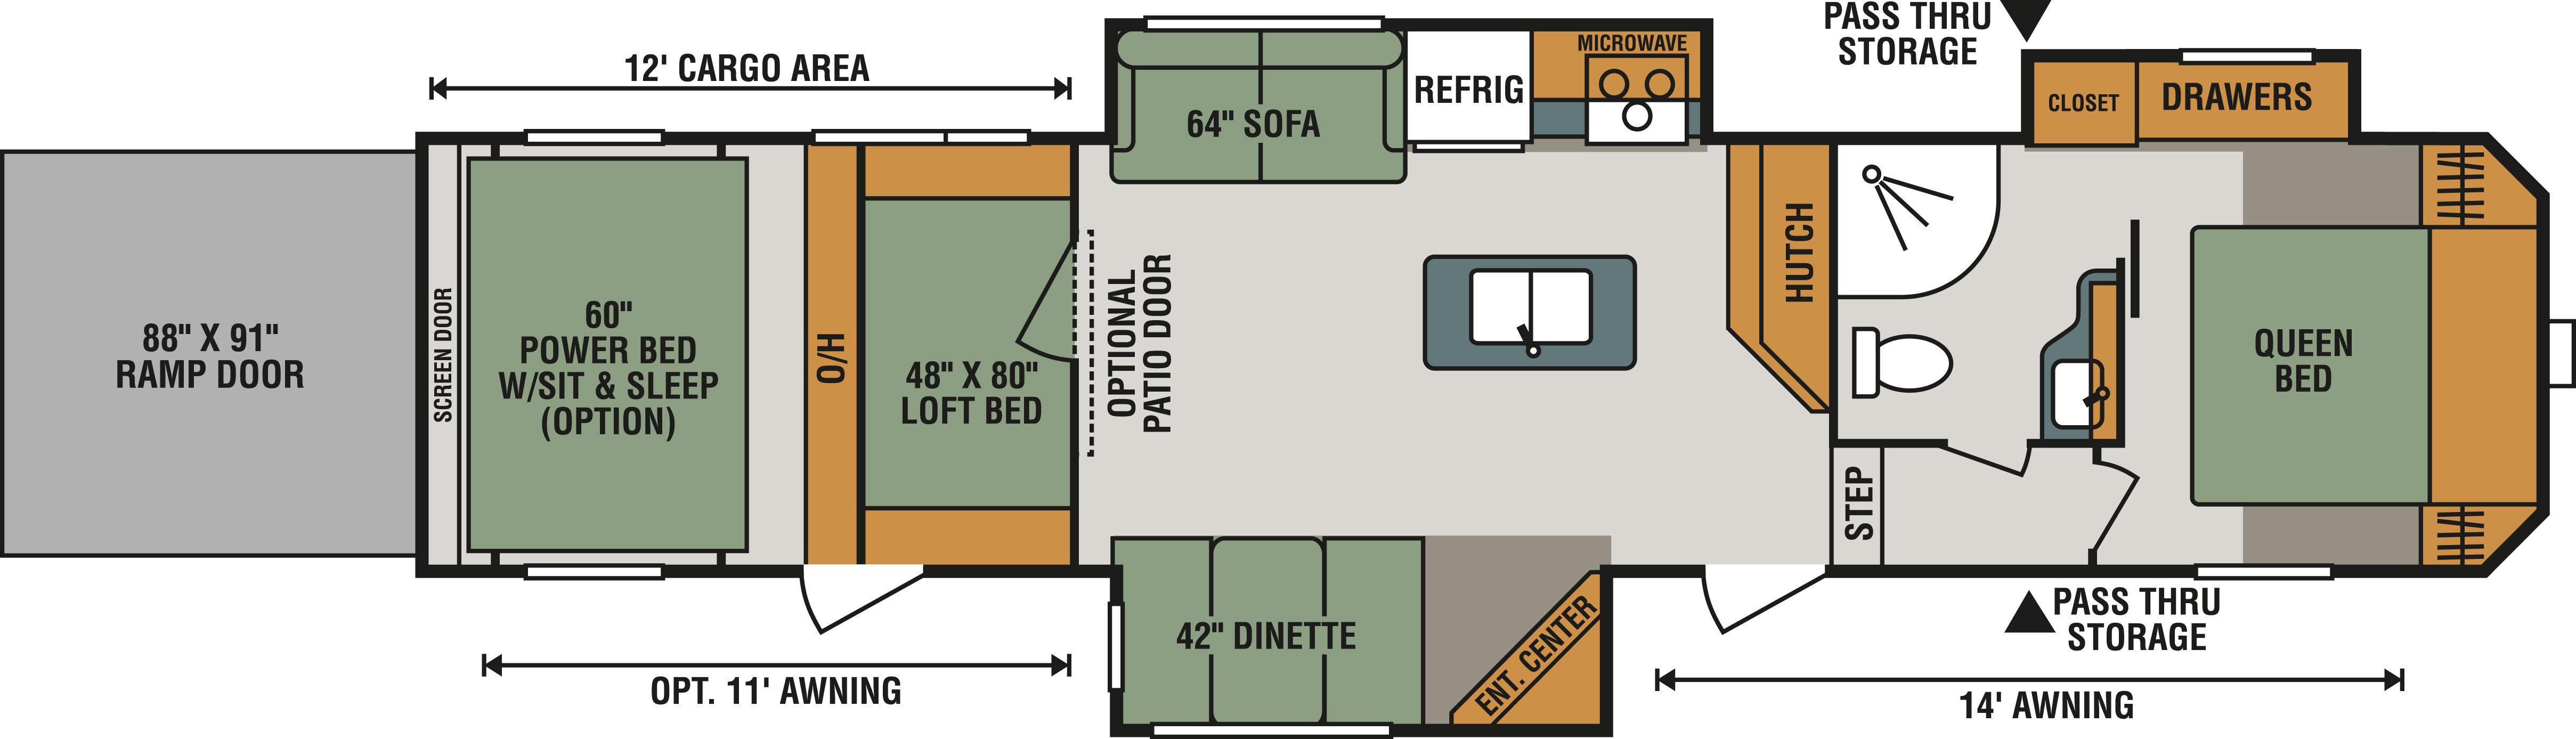 373TH12 Floorplan